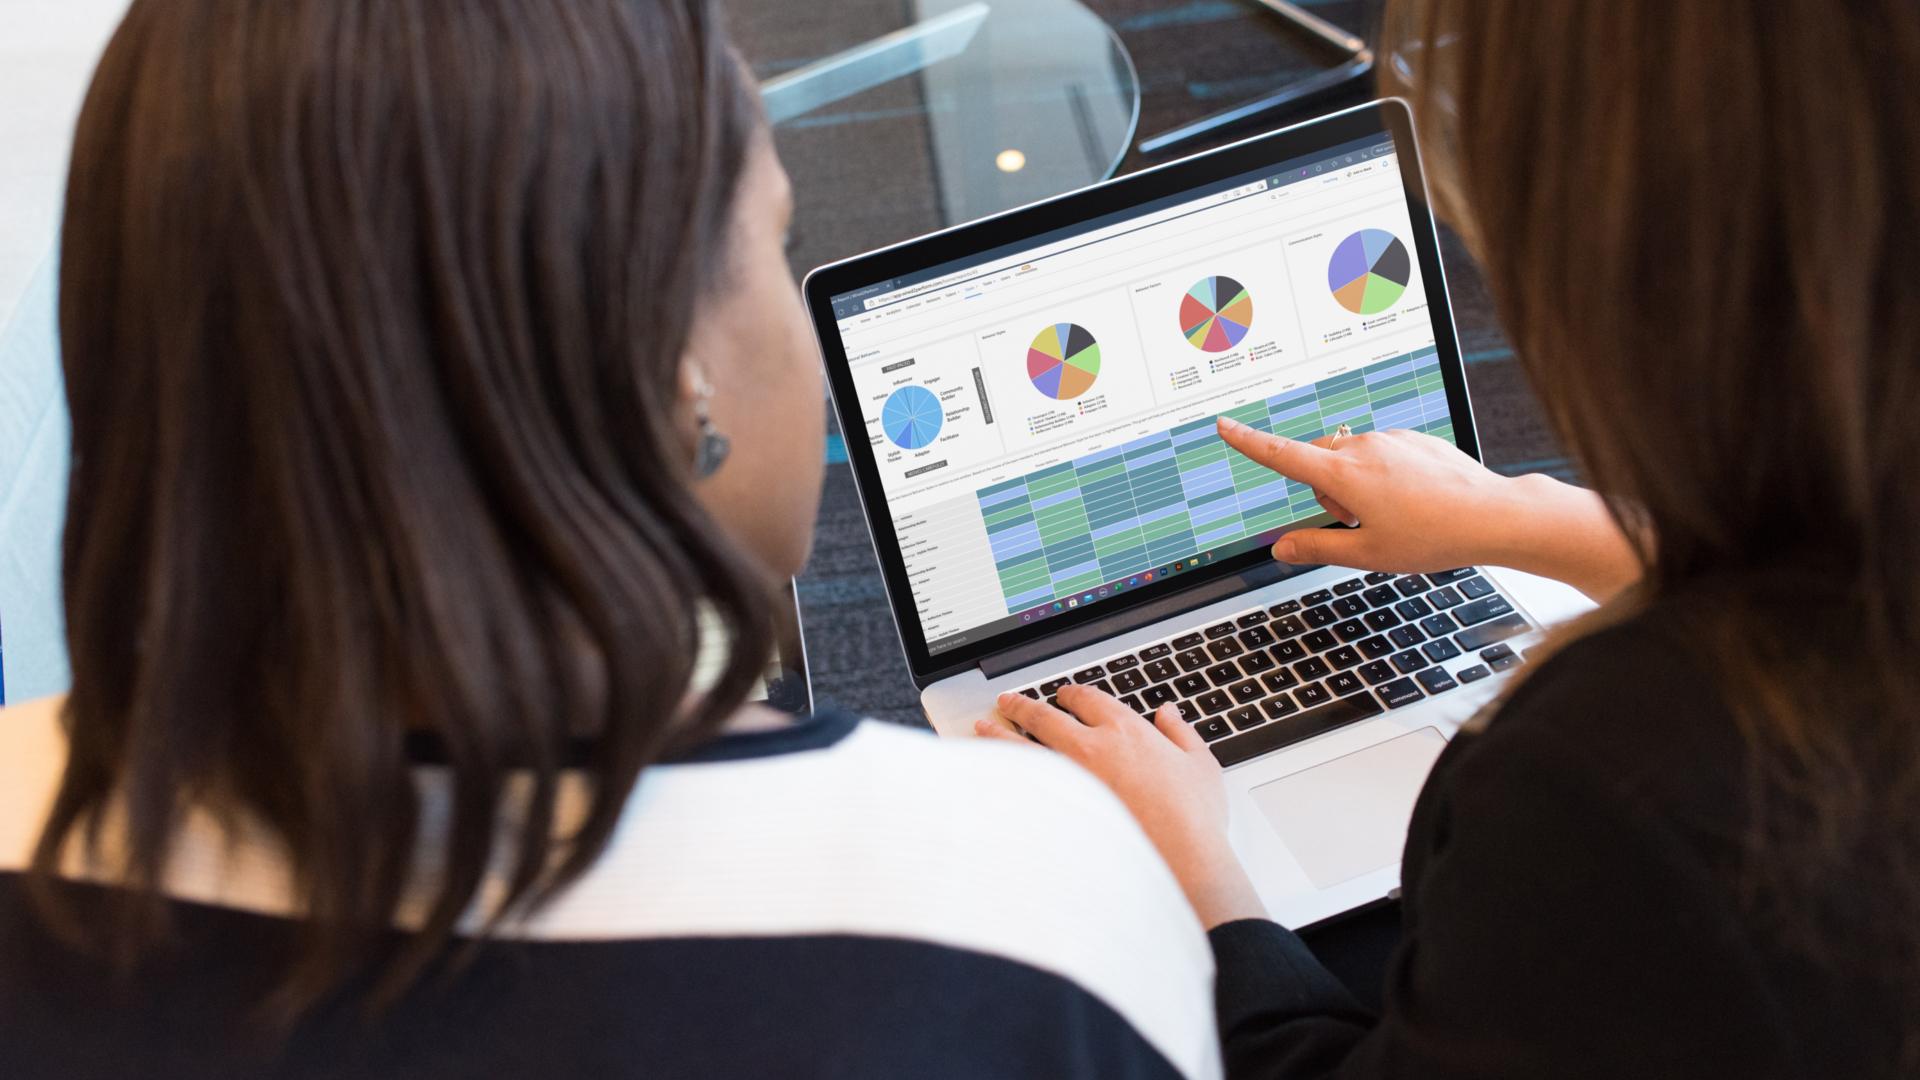 OEIJJX36 TI Two woman working on laptop